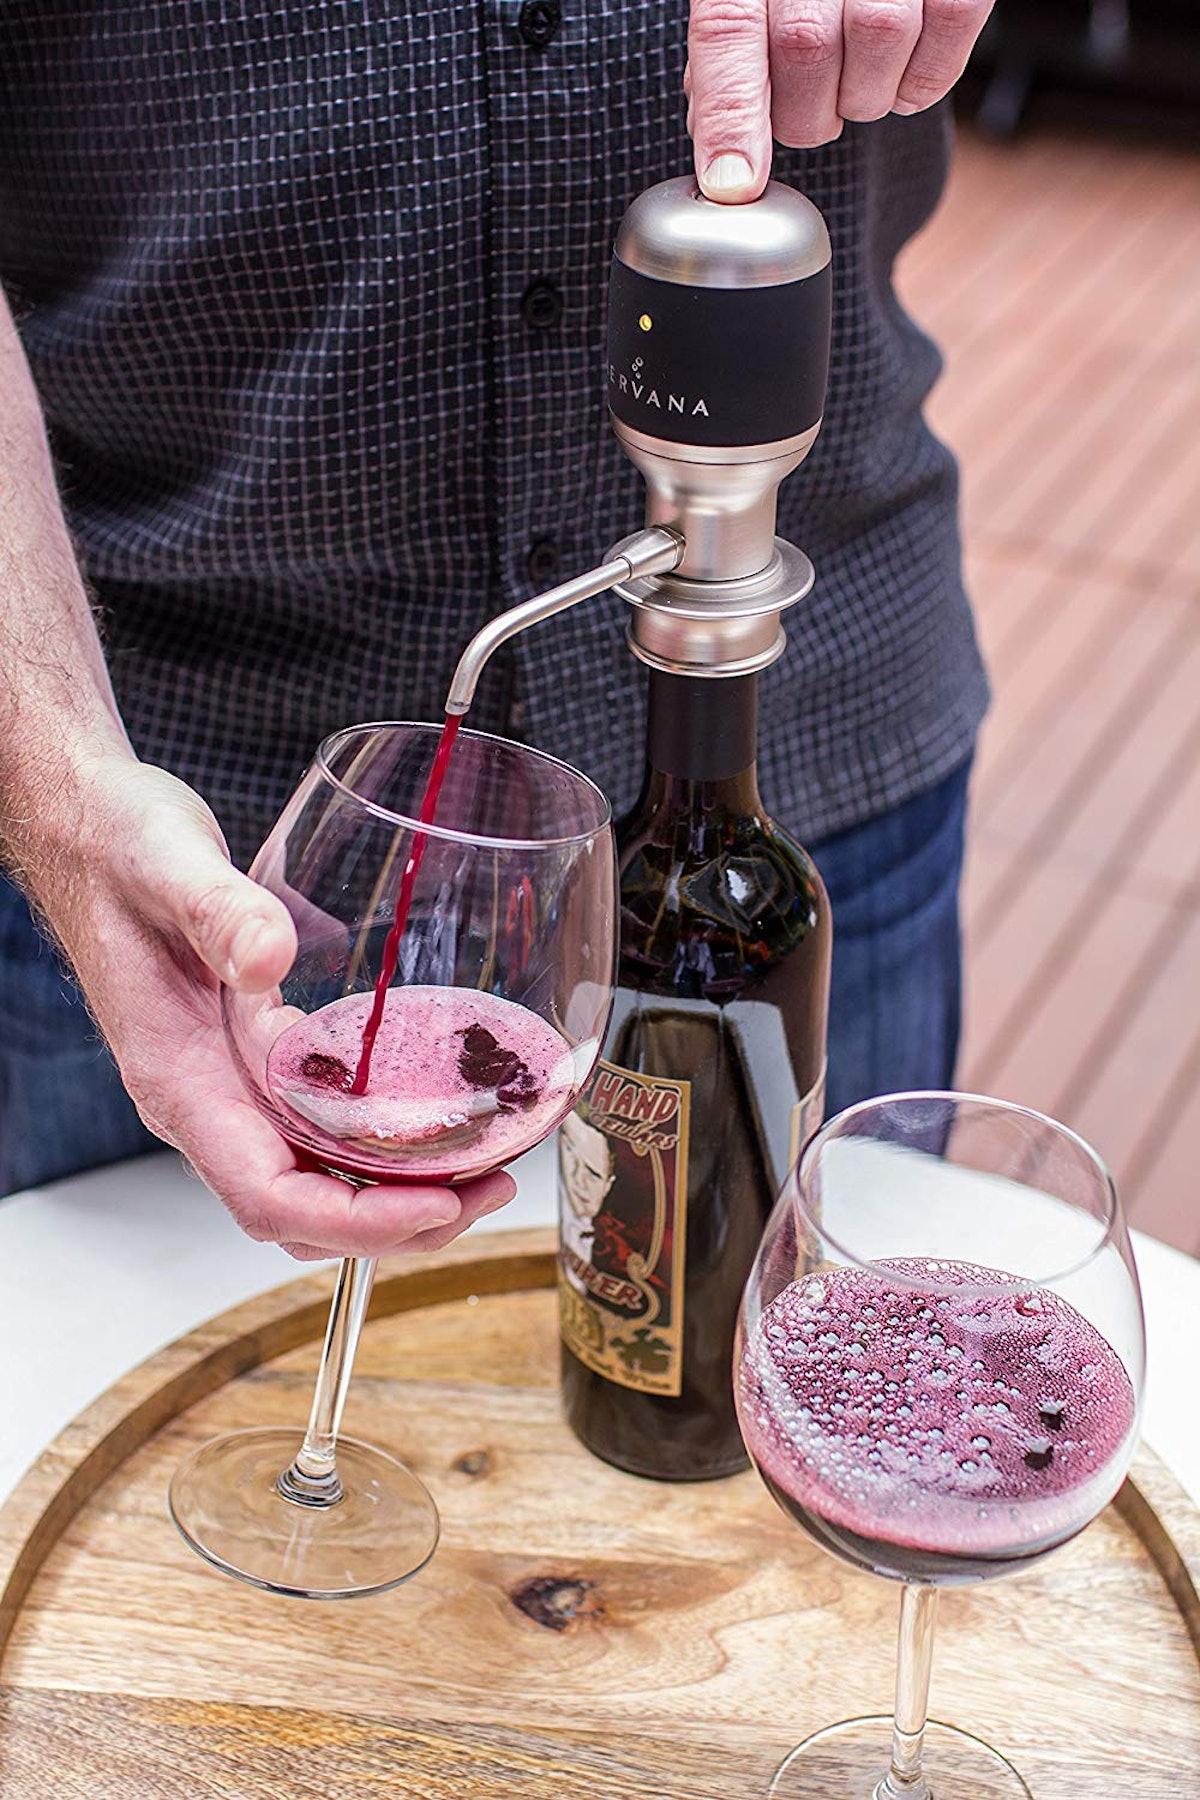 Aervana Original 1-Touch Luxury Wine Aerator